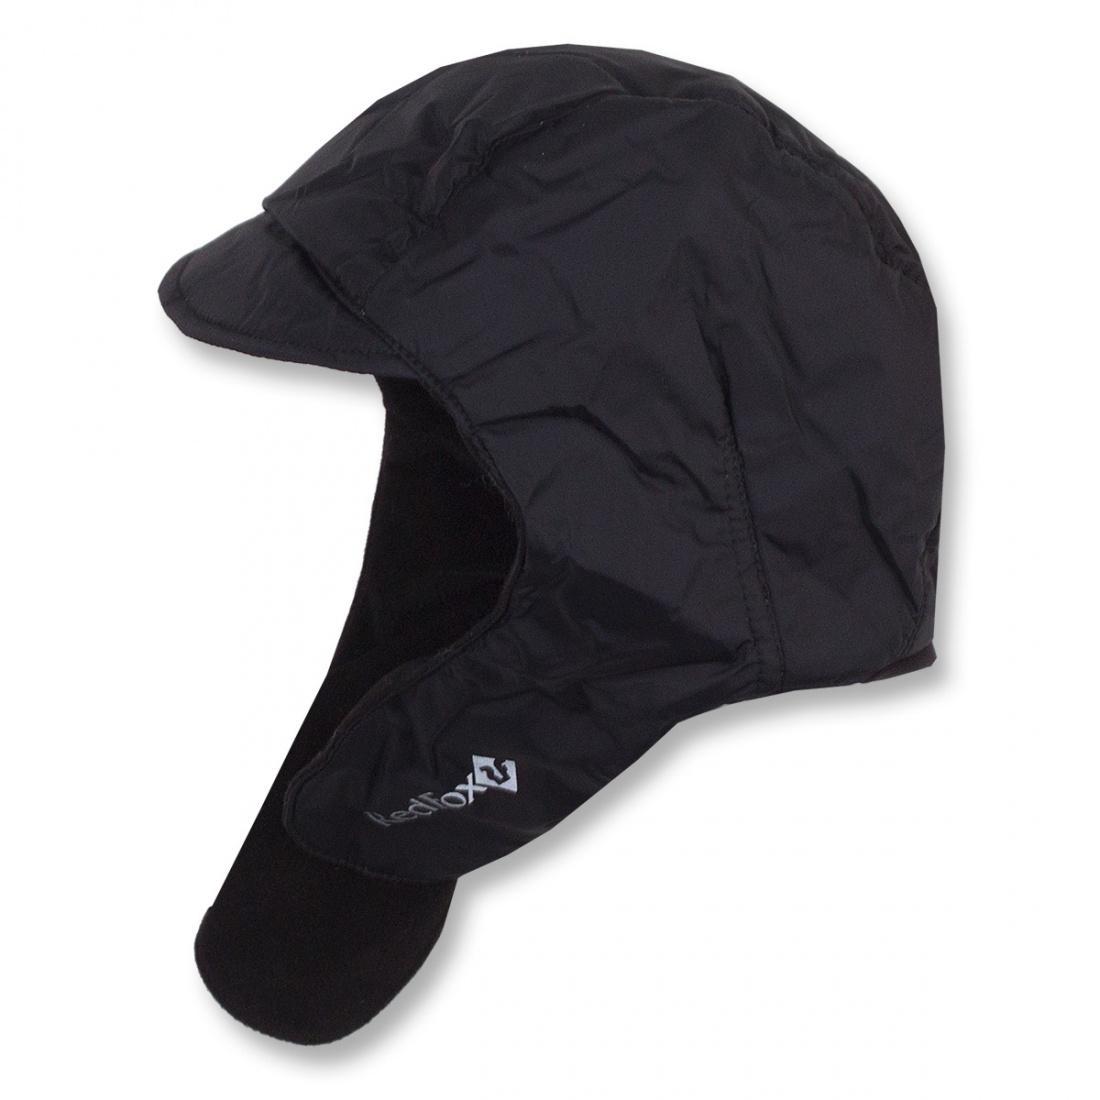 Шапка детска PilotУшанки<br><br> Удобна стильна шапочка дл детей от года. <br><br> <br><br><br><br> Материал – Dry Factor 1000.<br><br> <br><br><br> Утеплитель – Omniterm Classic.<br><br> <br><br><br> Облегащий крой.<br><br> <br><br>...<br><br>Цвет: Черный<br>Размер: M